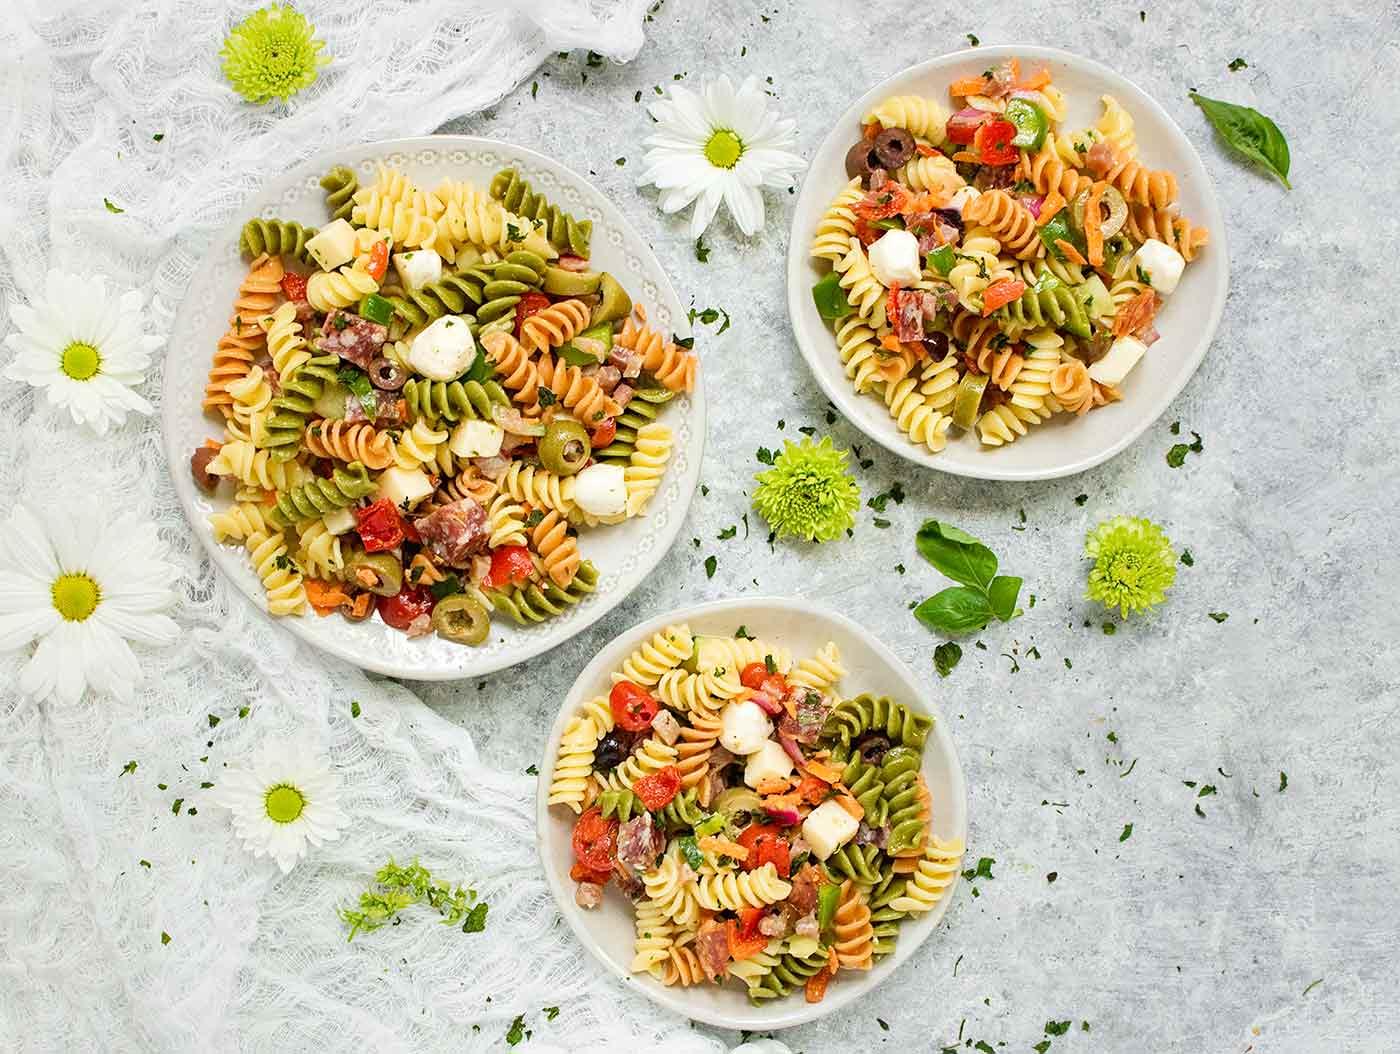 Three plates of pasta salad